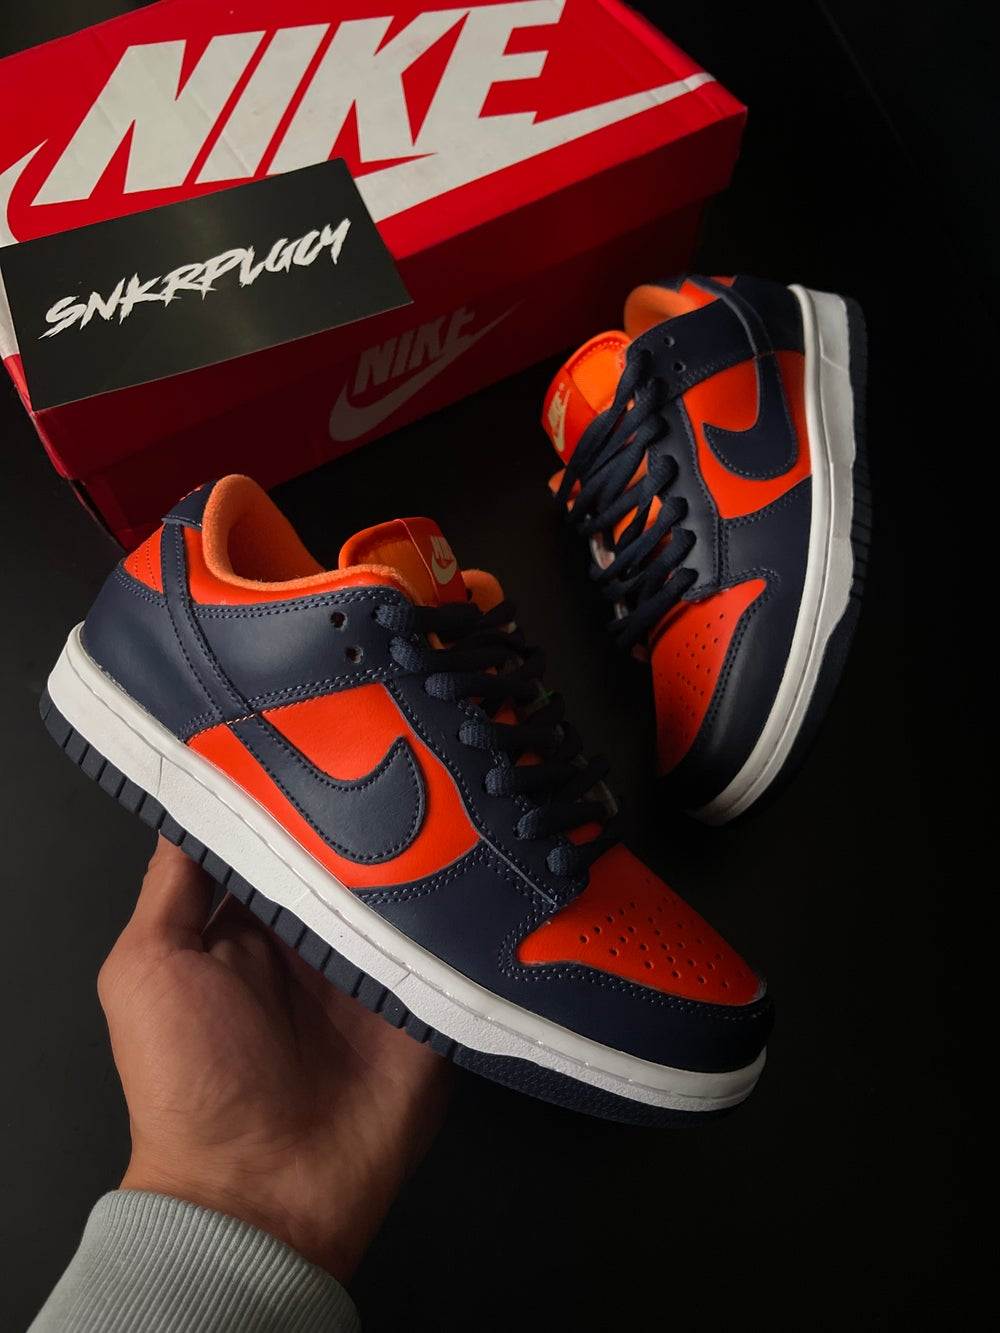 Nike Dunk Low / SP Champ Colors University Orange Marine